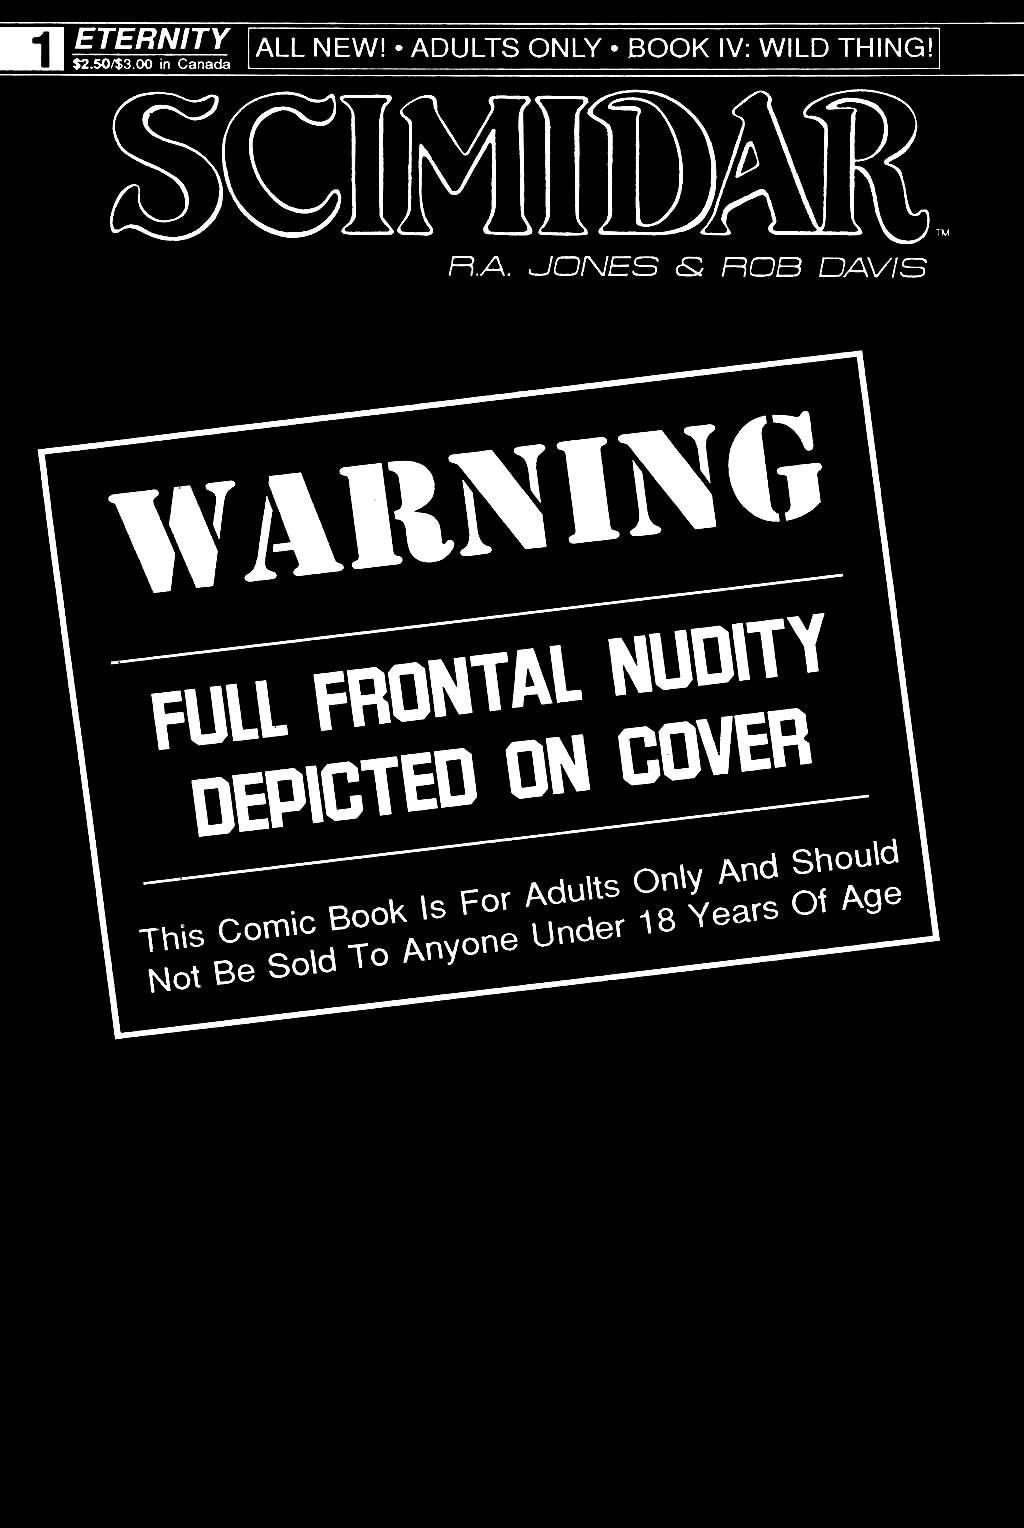 Scimidar Book IV: Wild Thing 1 Page 1